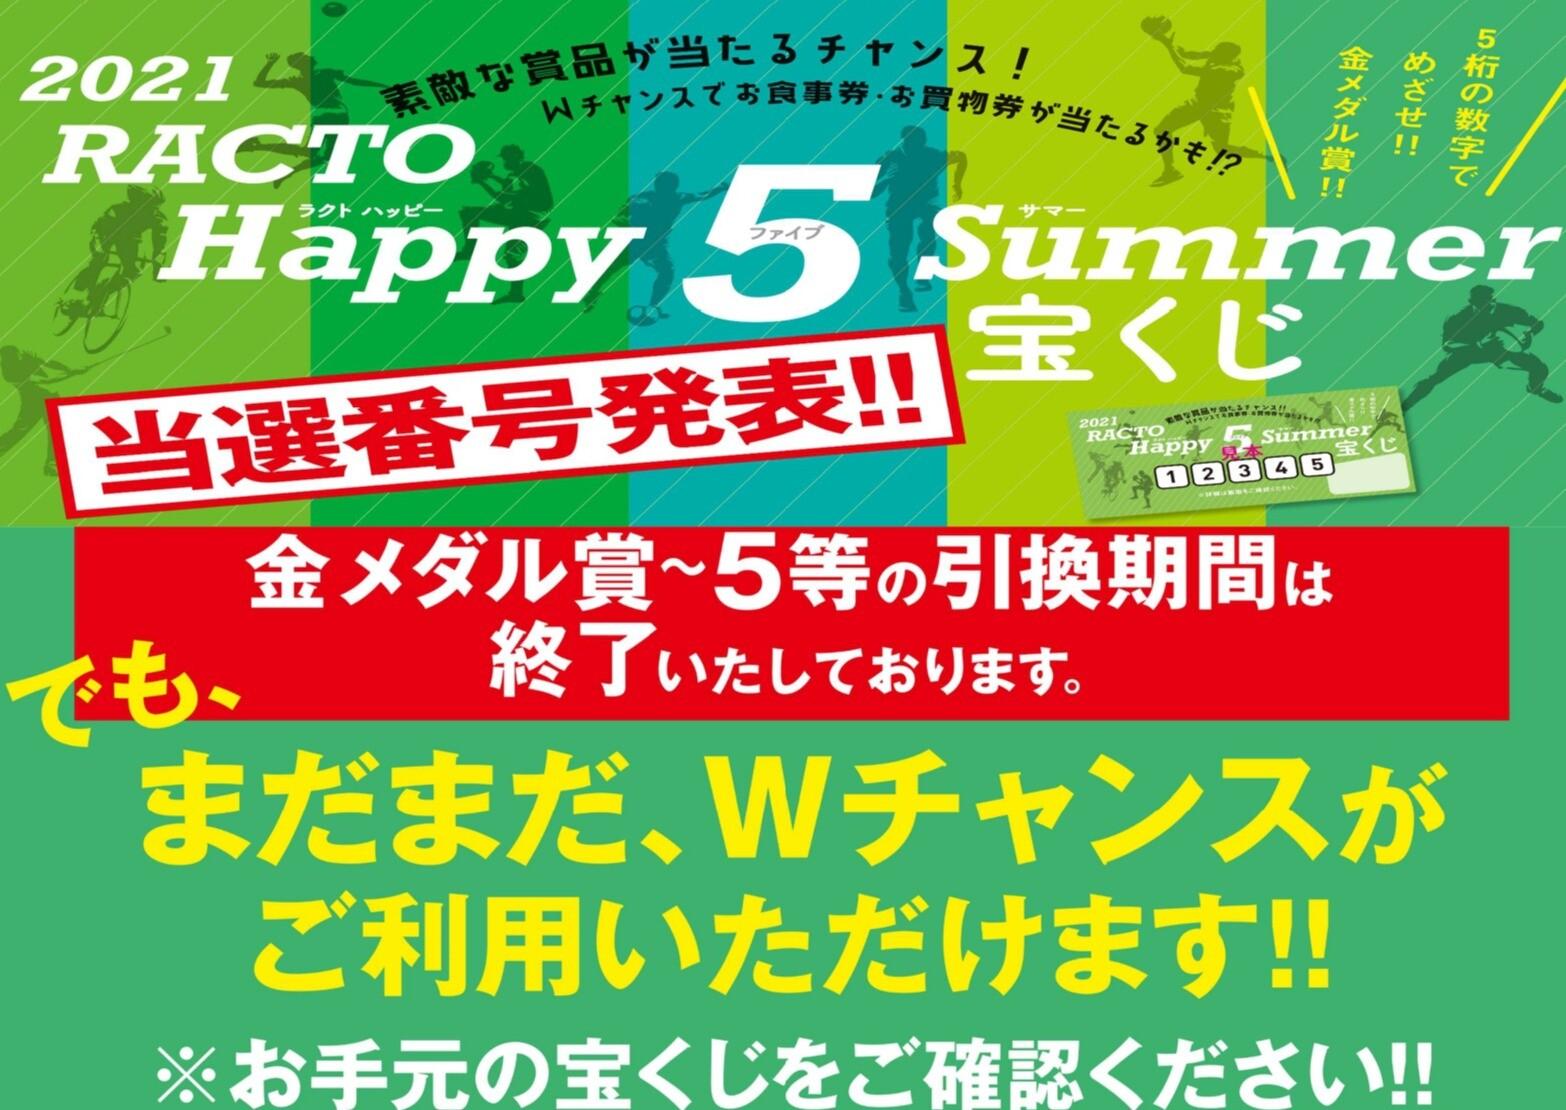 RACTO ハッピー 5 サマー宝くじ Wチャンス賞継続中!